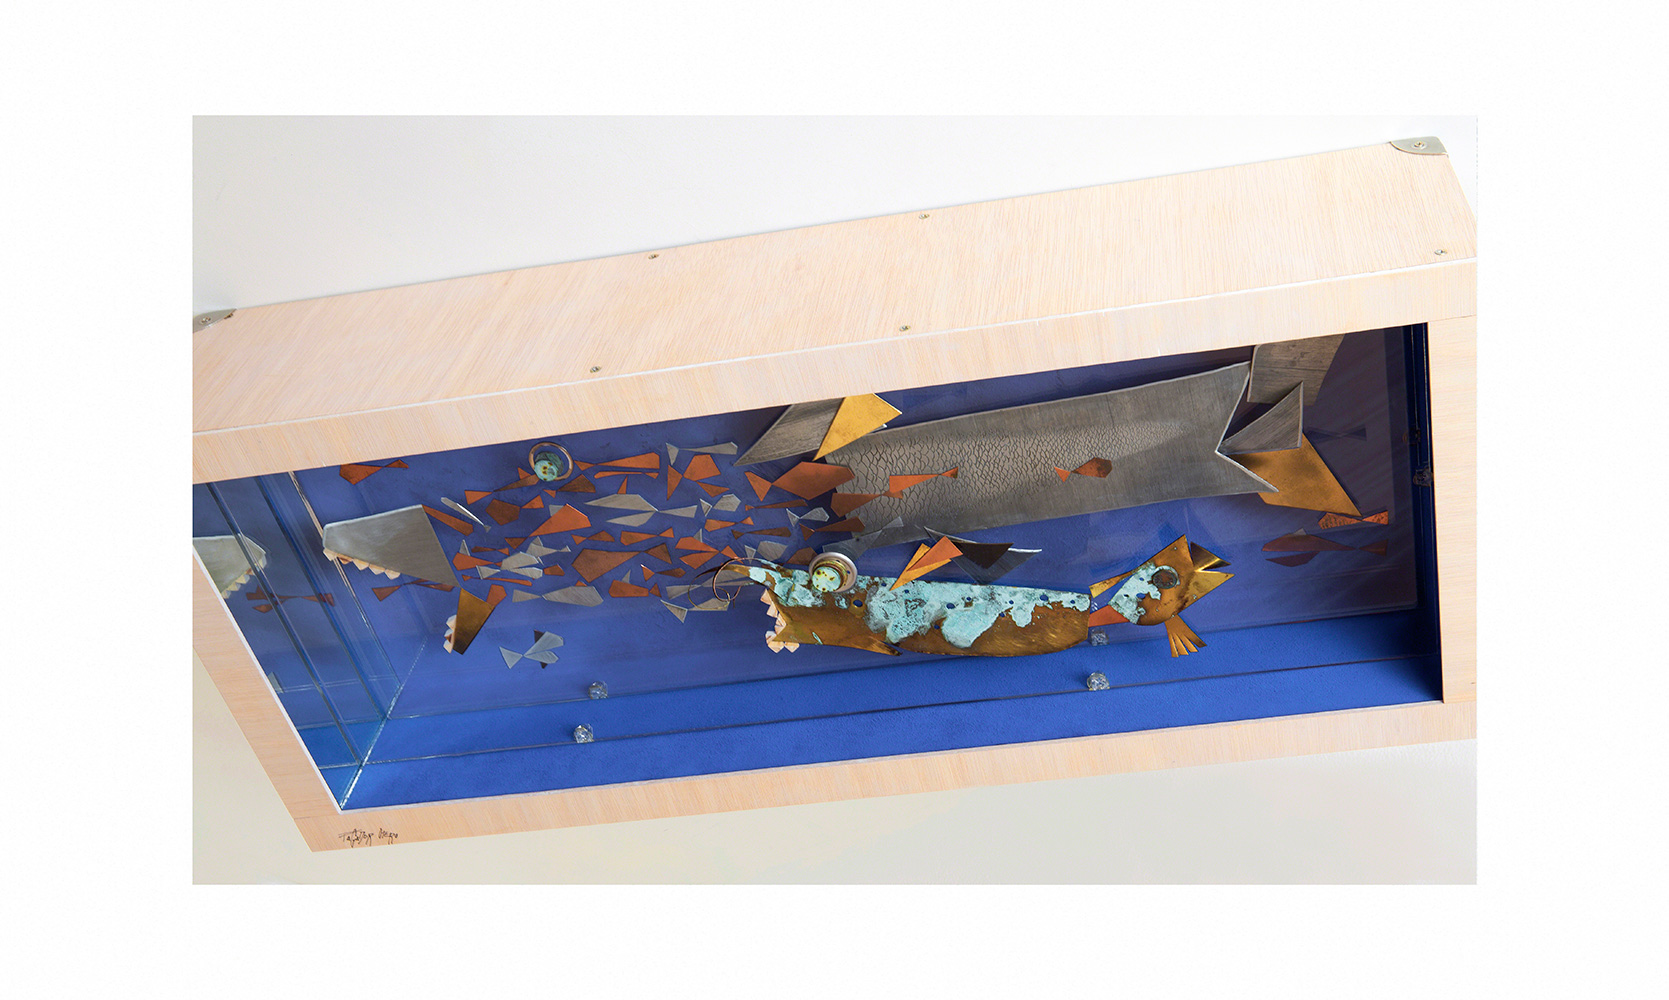 PISCINA CON PELIGRO A - 34x86x16,5 cm - Reciclaje y Ensamblado - Serie Animalario - Proyecto S.O.S.tenible - 2016 - Gata de Gorgos.